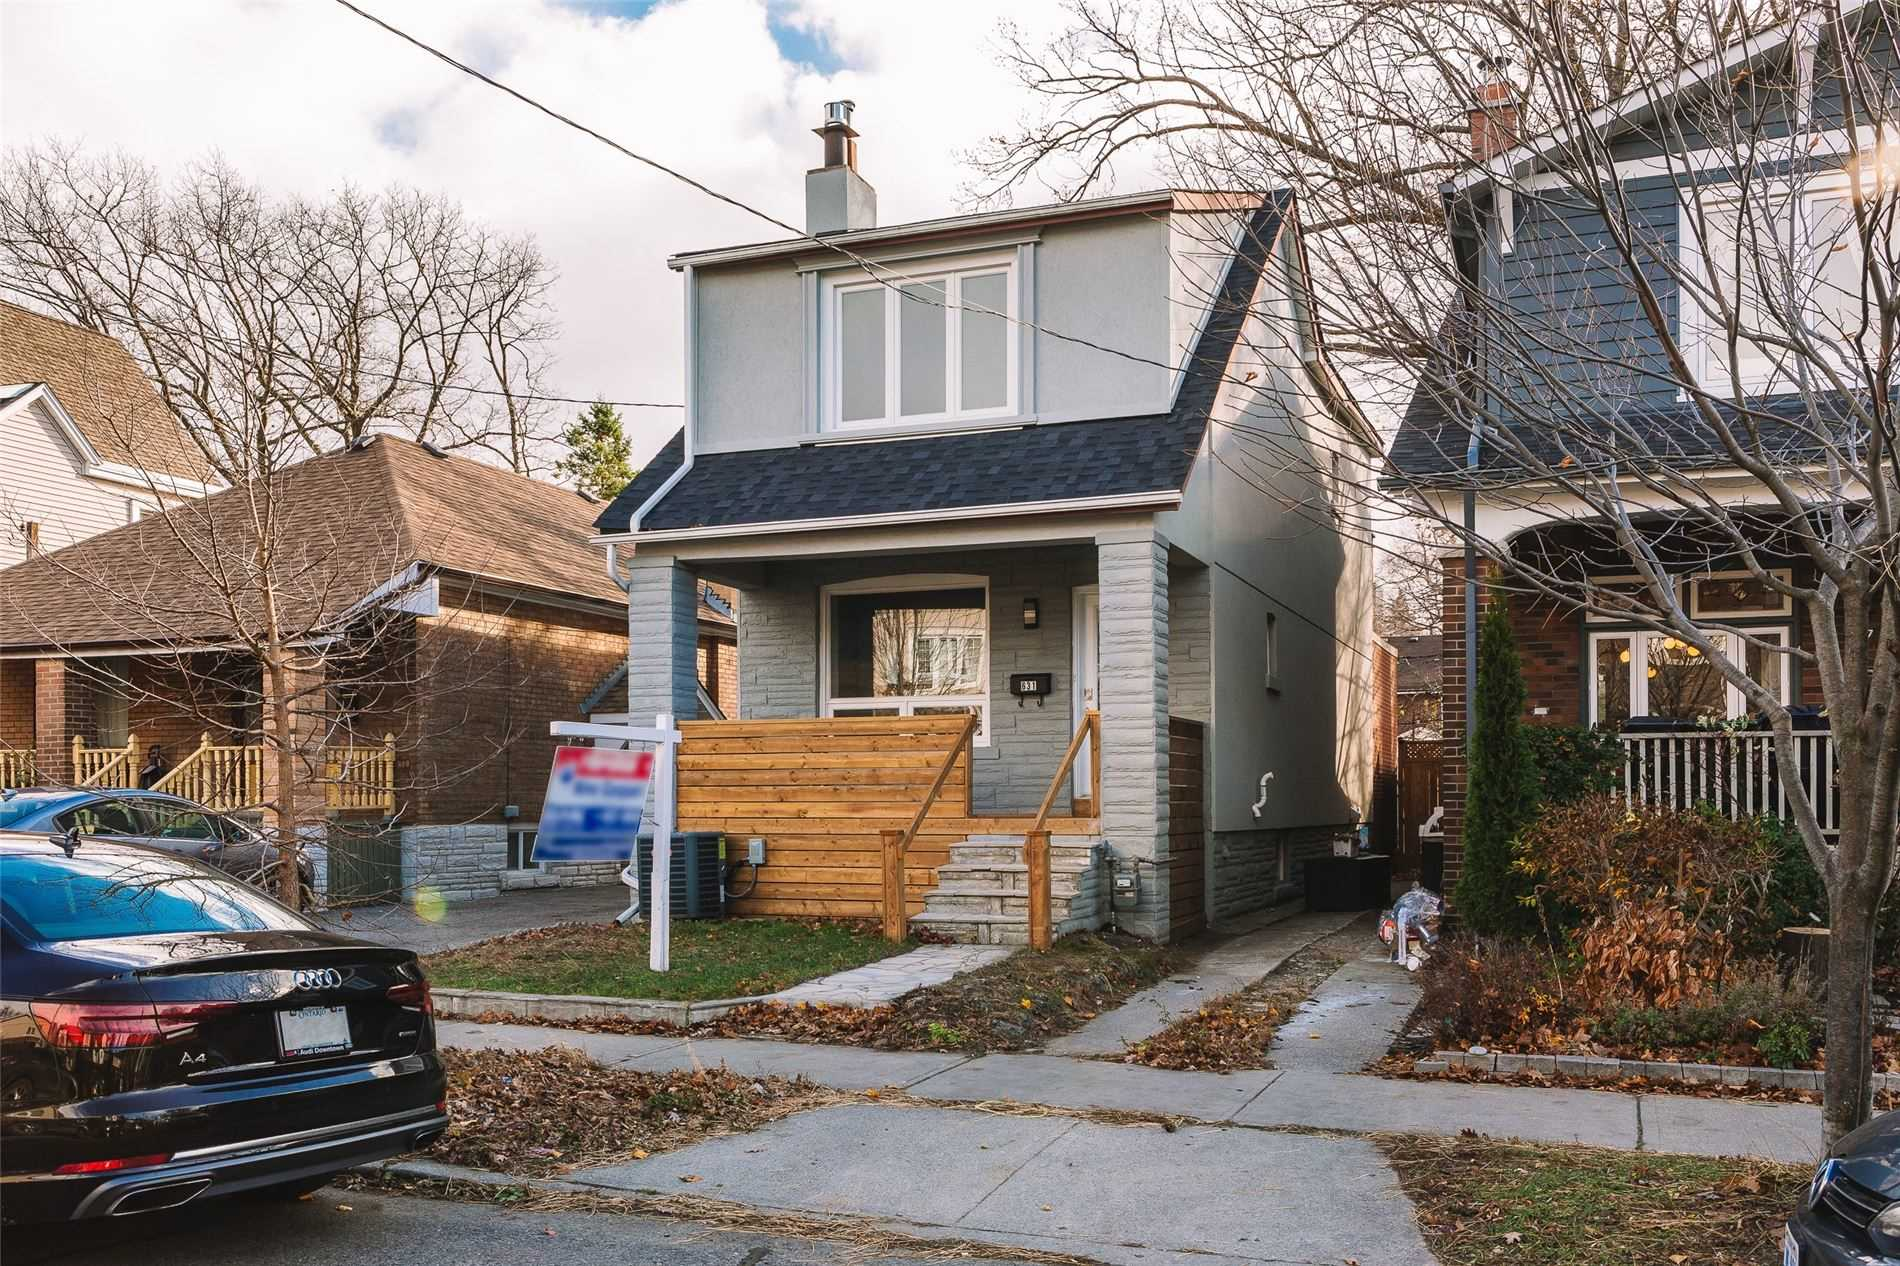 631 Glebeholme Blvd, Toronto, Ontario M4C 1V5, 3 Bedrooms Bedrooms, 7 Rooms Rooms,2 BathroomsBathrooms,Detached,For Sale,Glebeholme,E4994006